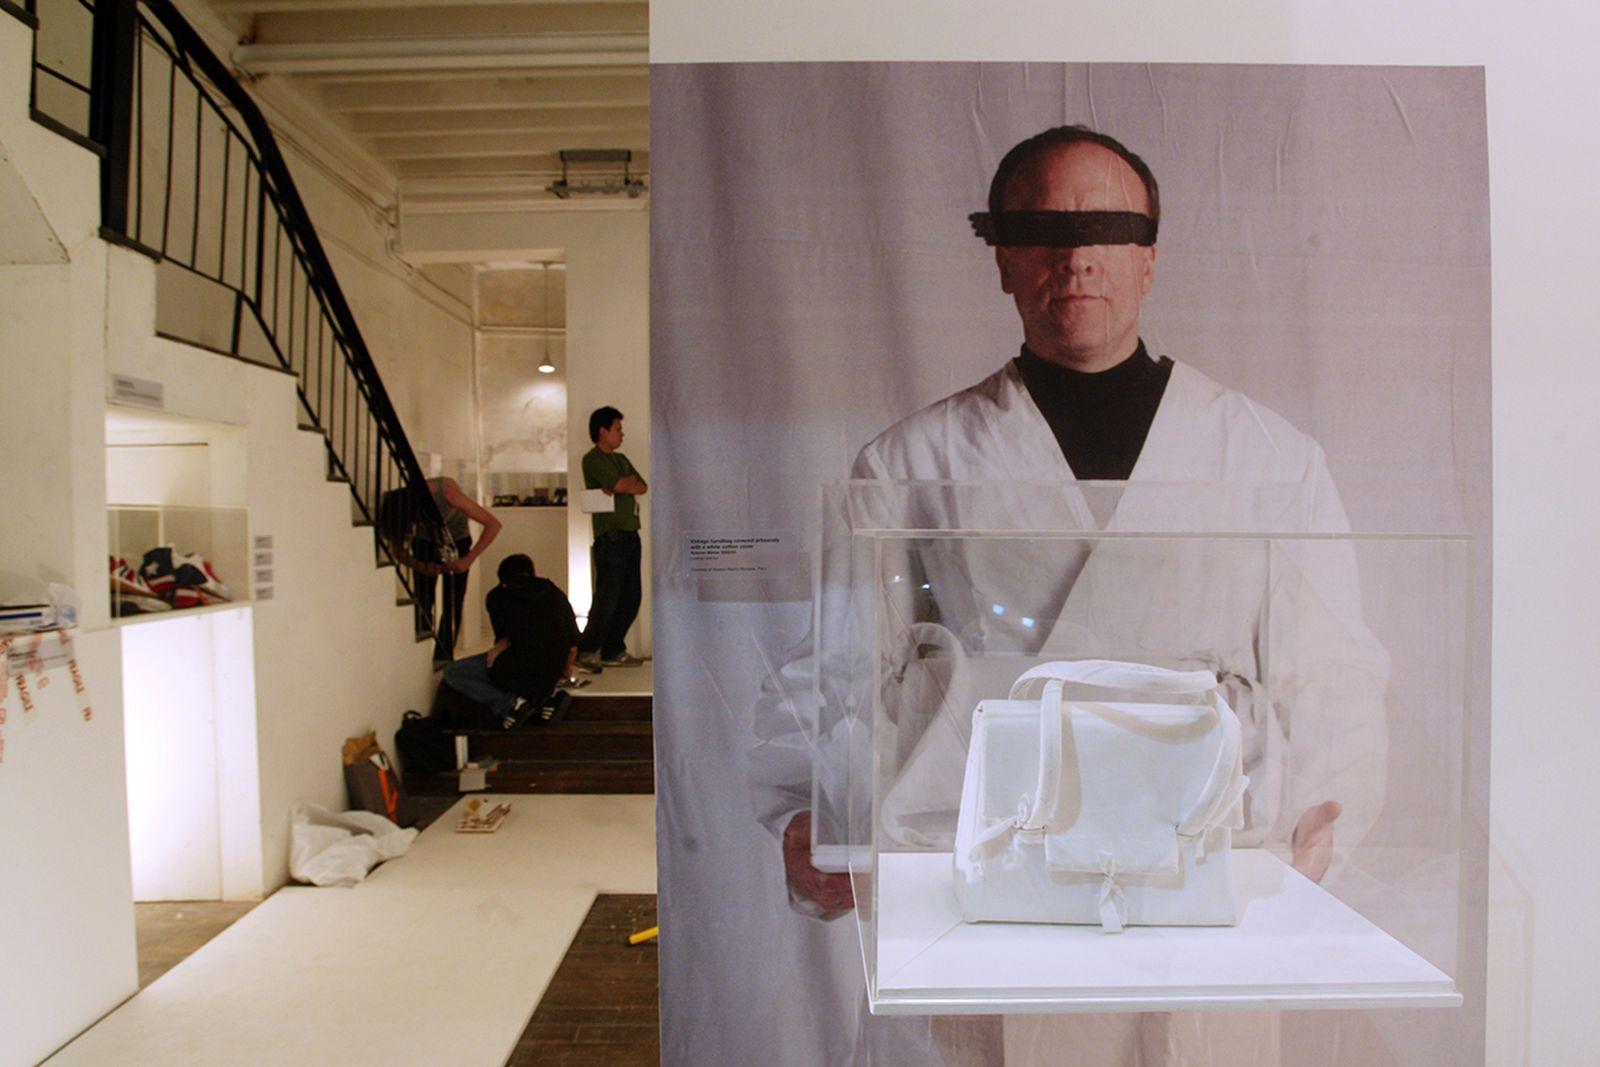 martin margiela artist art works solo show exhibit galeries lafayette zeno x represent sculpture